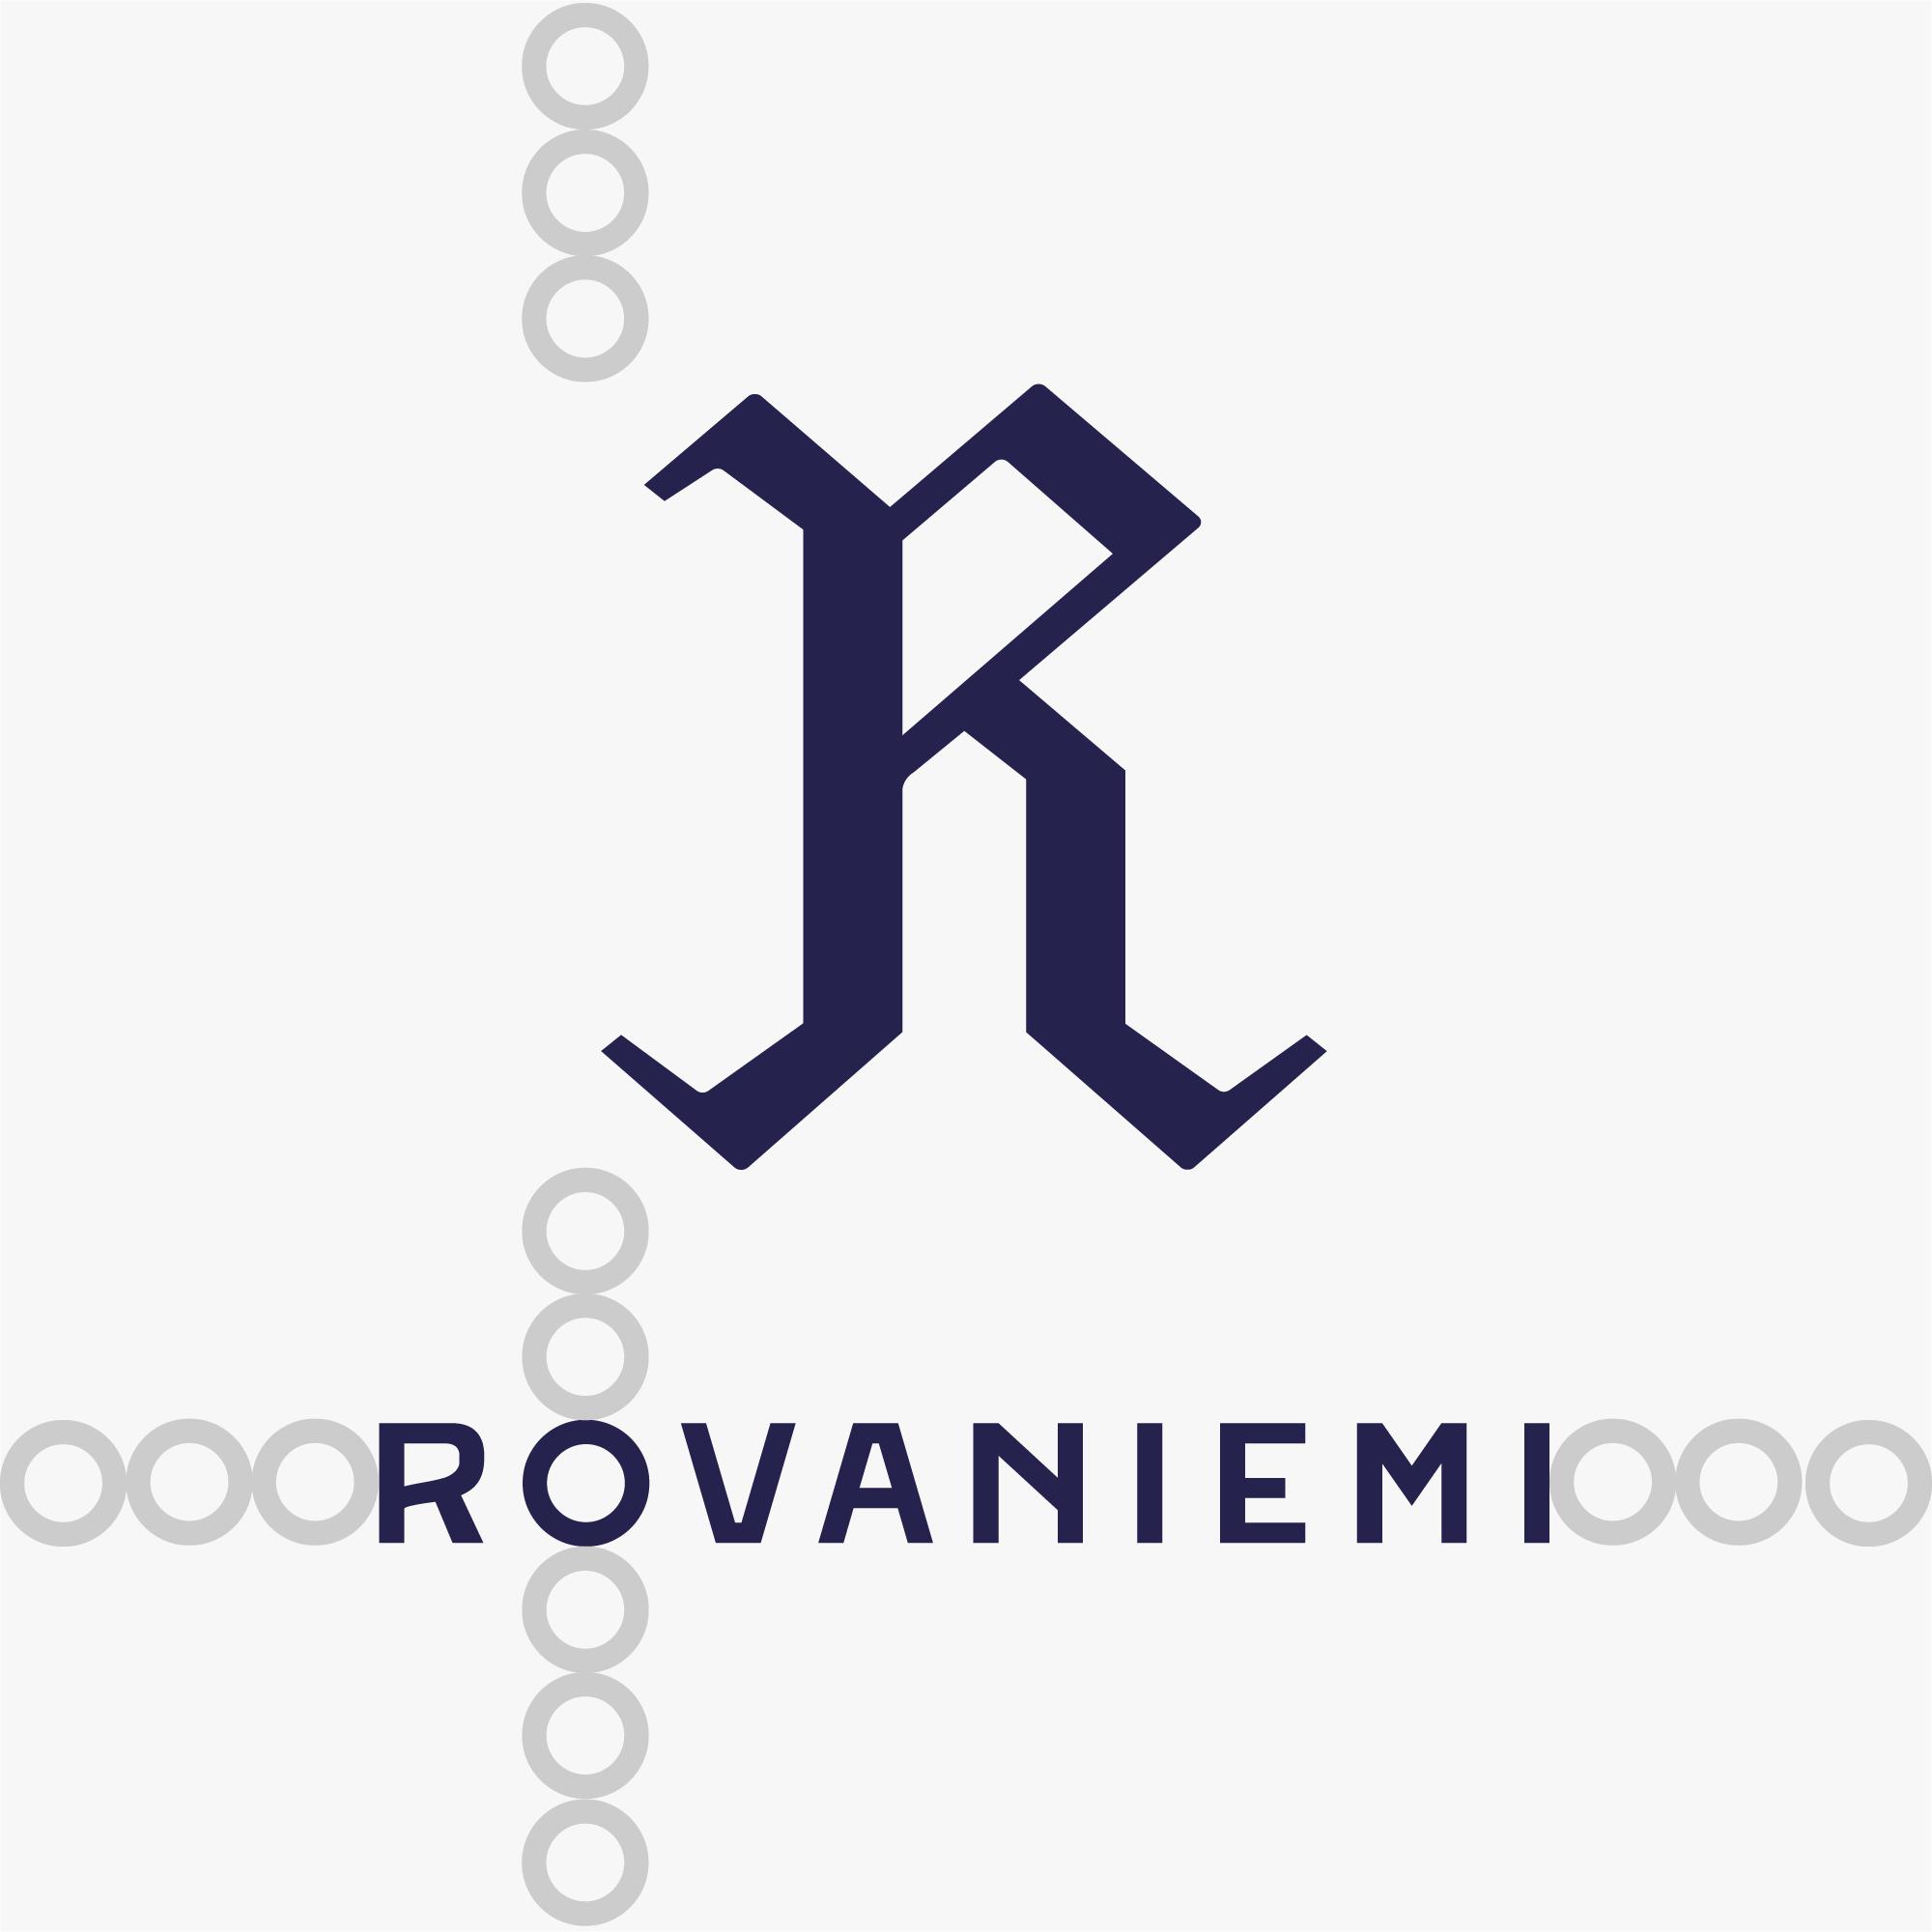 Rovaniemi-logo-pino-suoja-alue